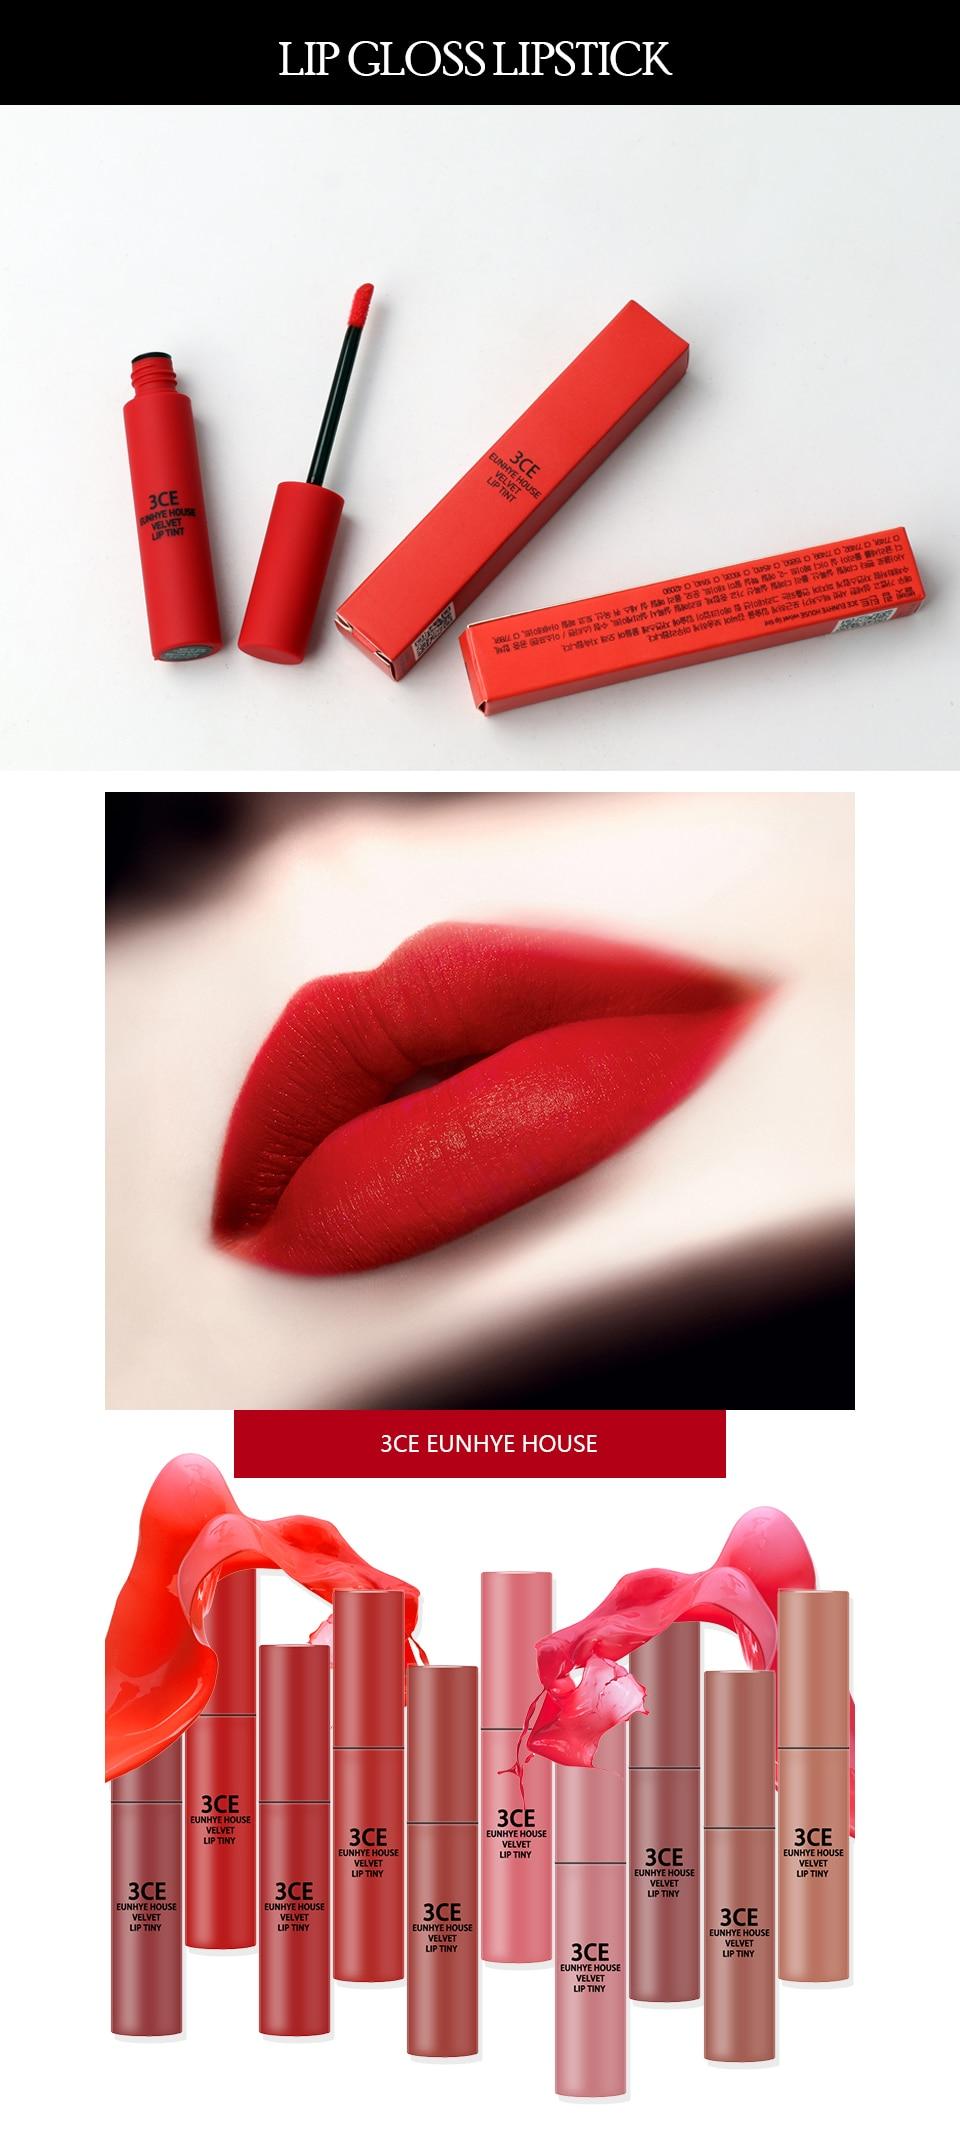 3CE Eunhye House Brand New Lip Cosmetics 3 colors Lip glaze Moisturizer Long-lasting Lip Makeup for common 12